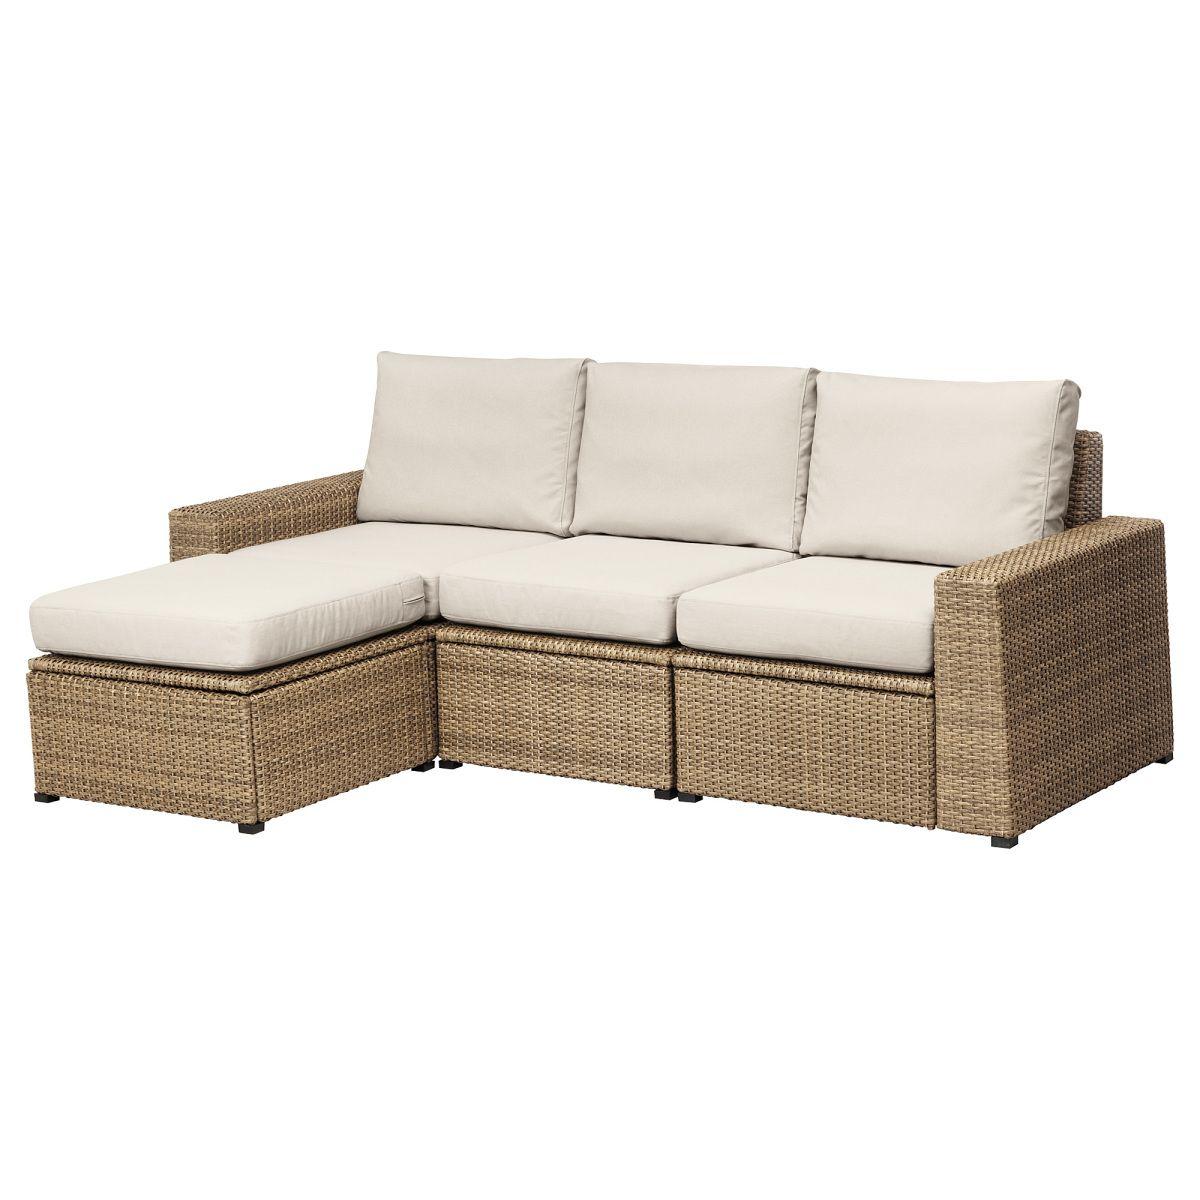 Solleron 3er Sofa Hocker Aussen Braun Beige Jetzt Bestellen Unter Https Moebel Ladendirekt De Garten Gartenmo Modulares Sofa Lounge Mobel Sofa